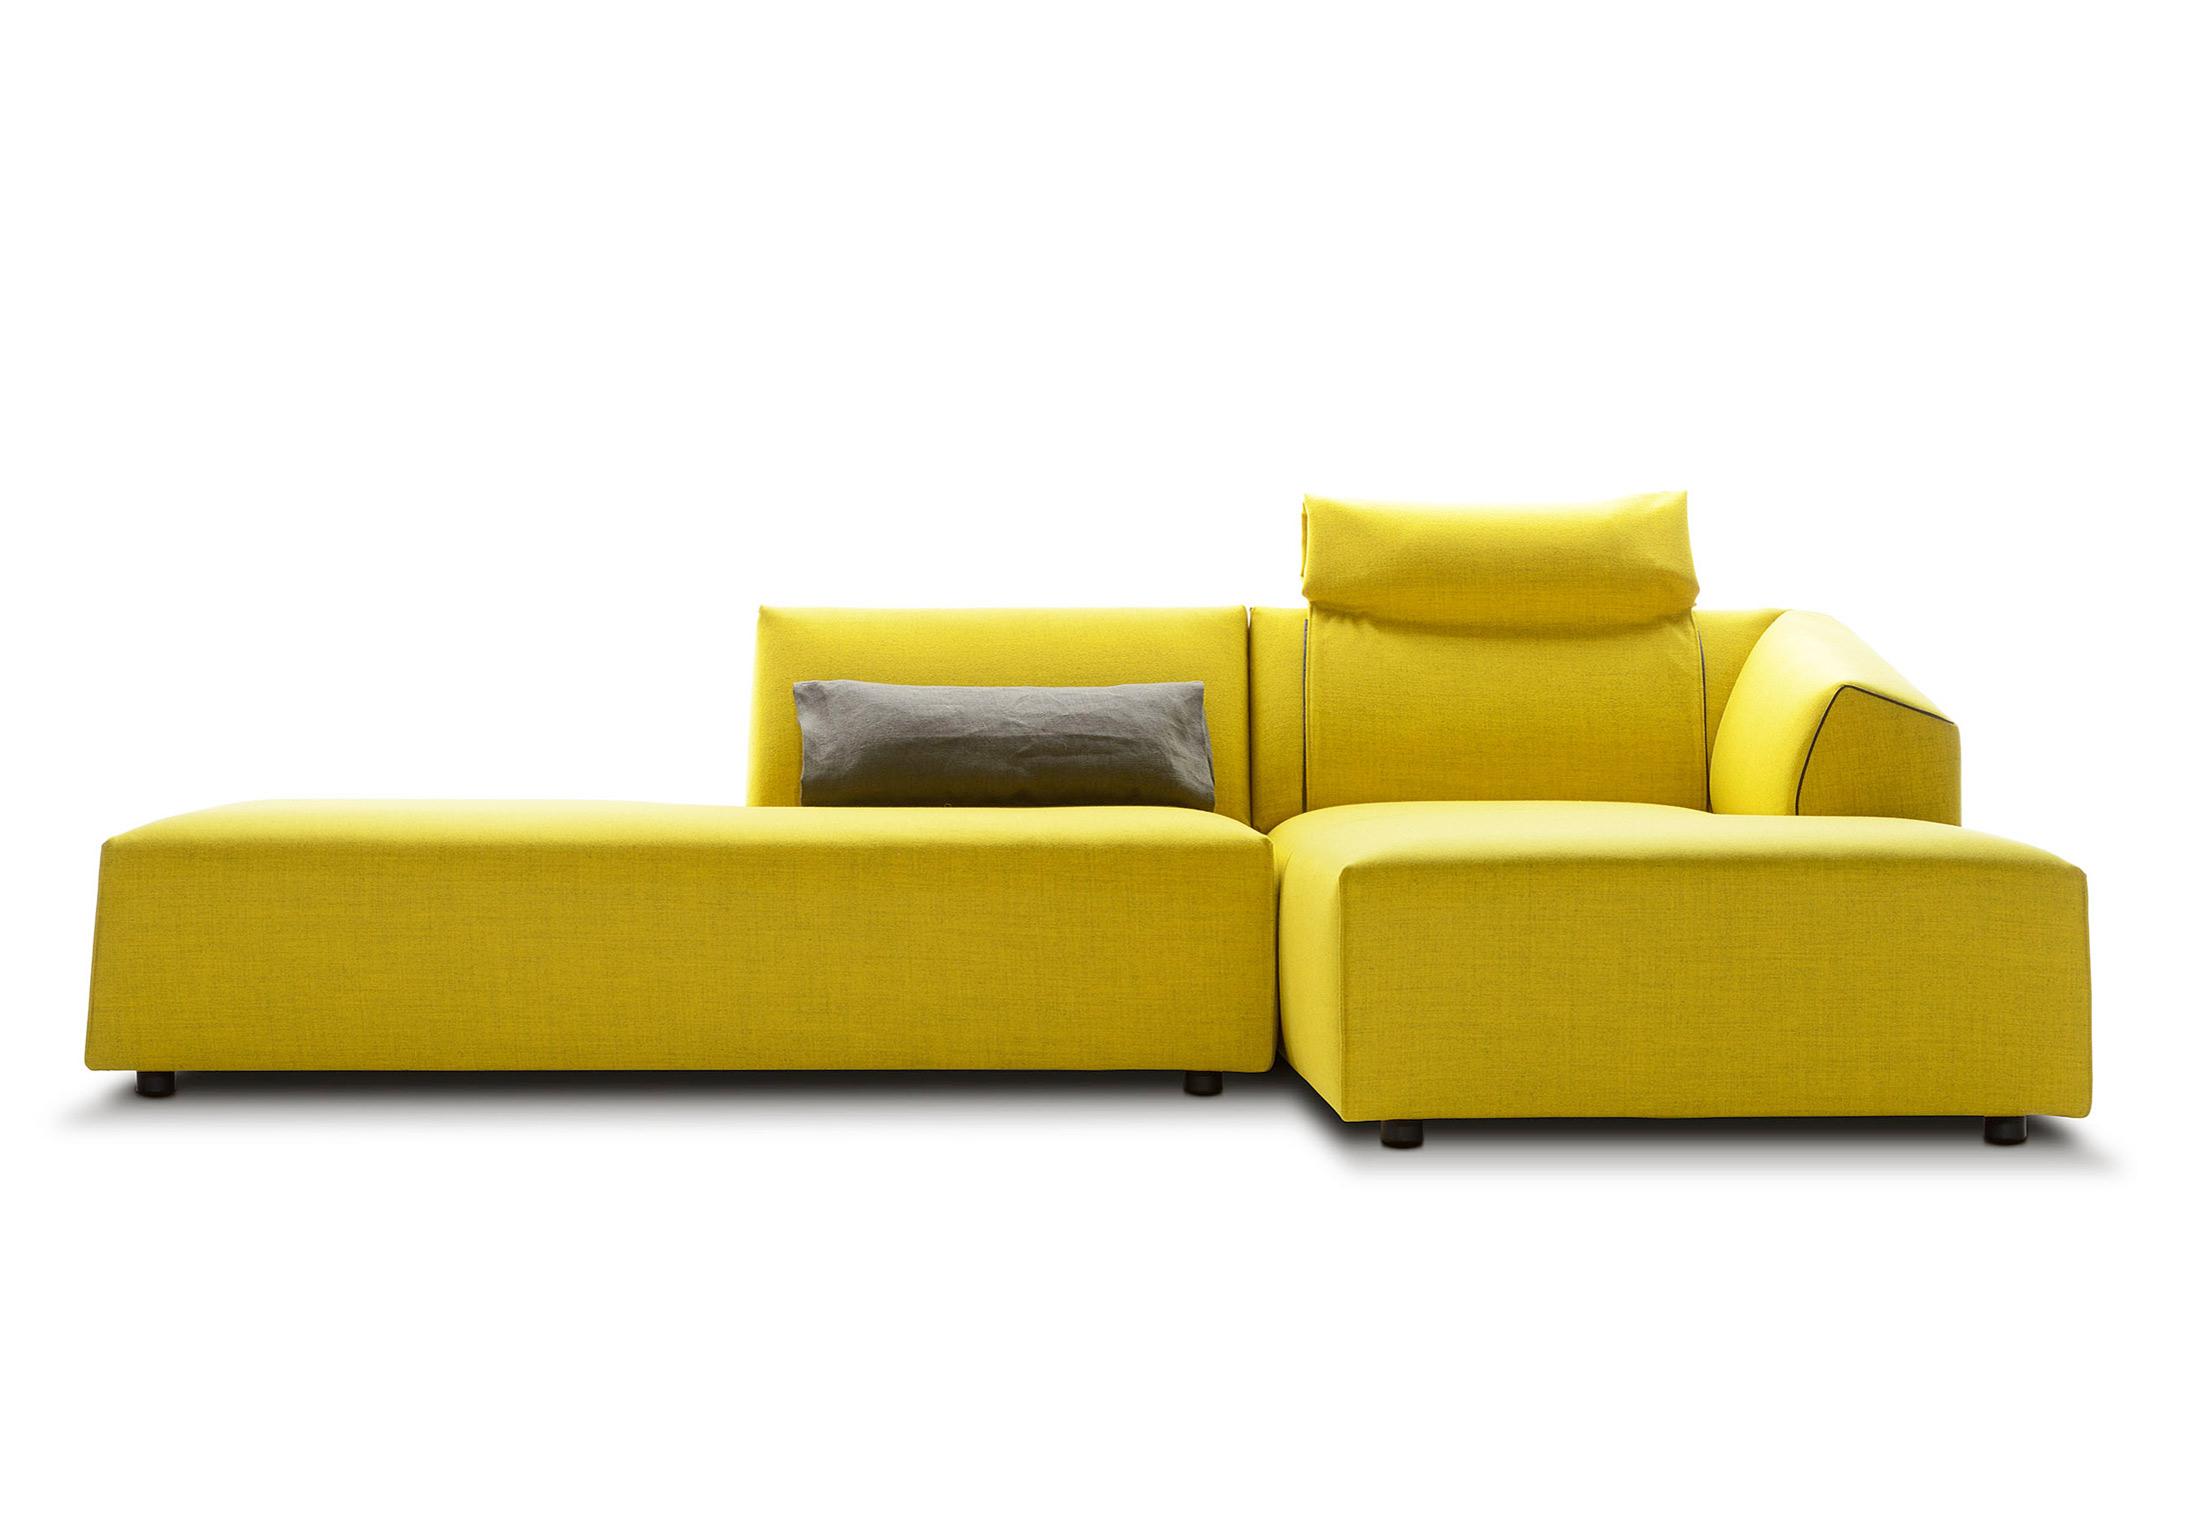 Azure MDF Italia Thea seating